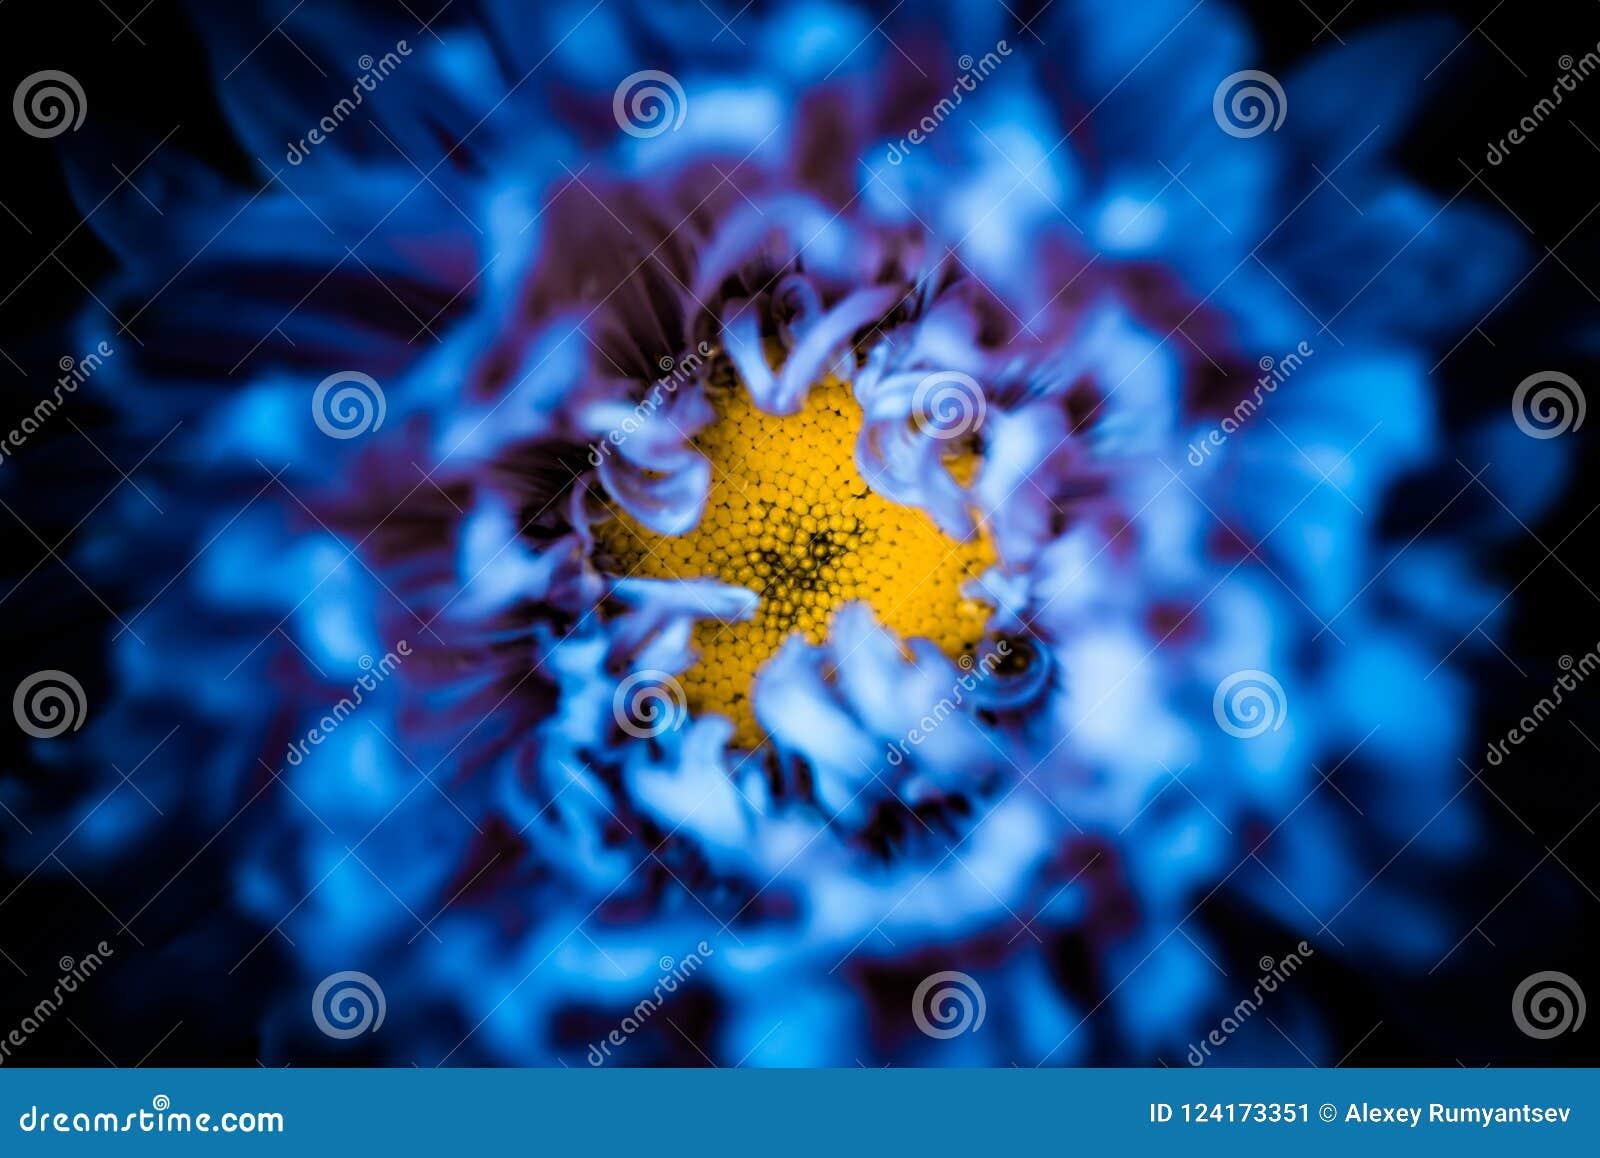 Inside abstract blue flower